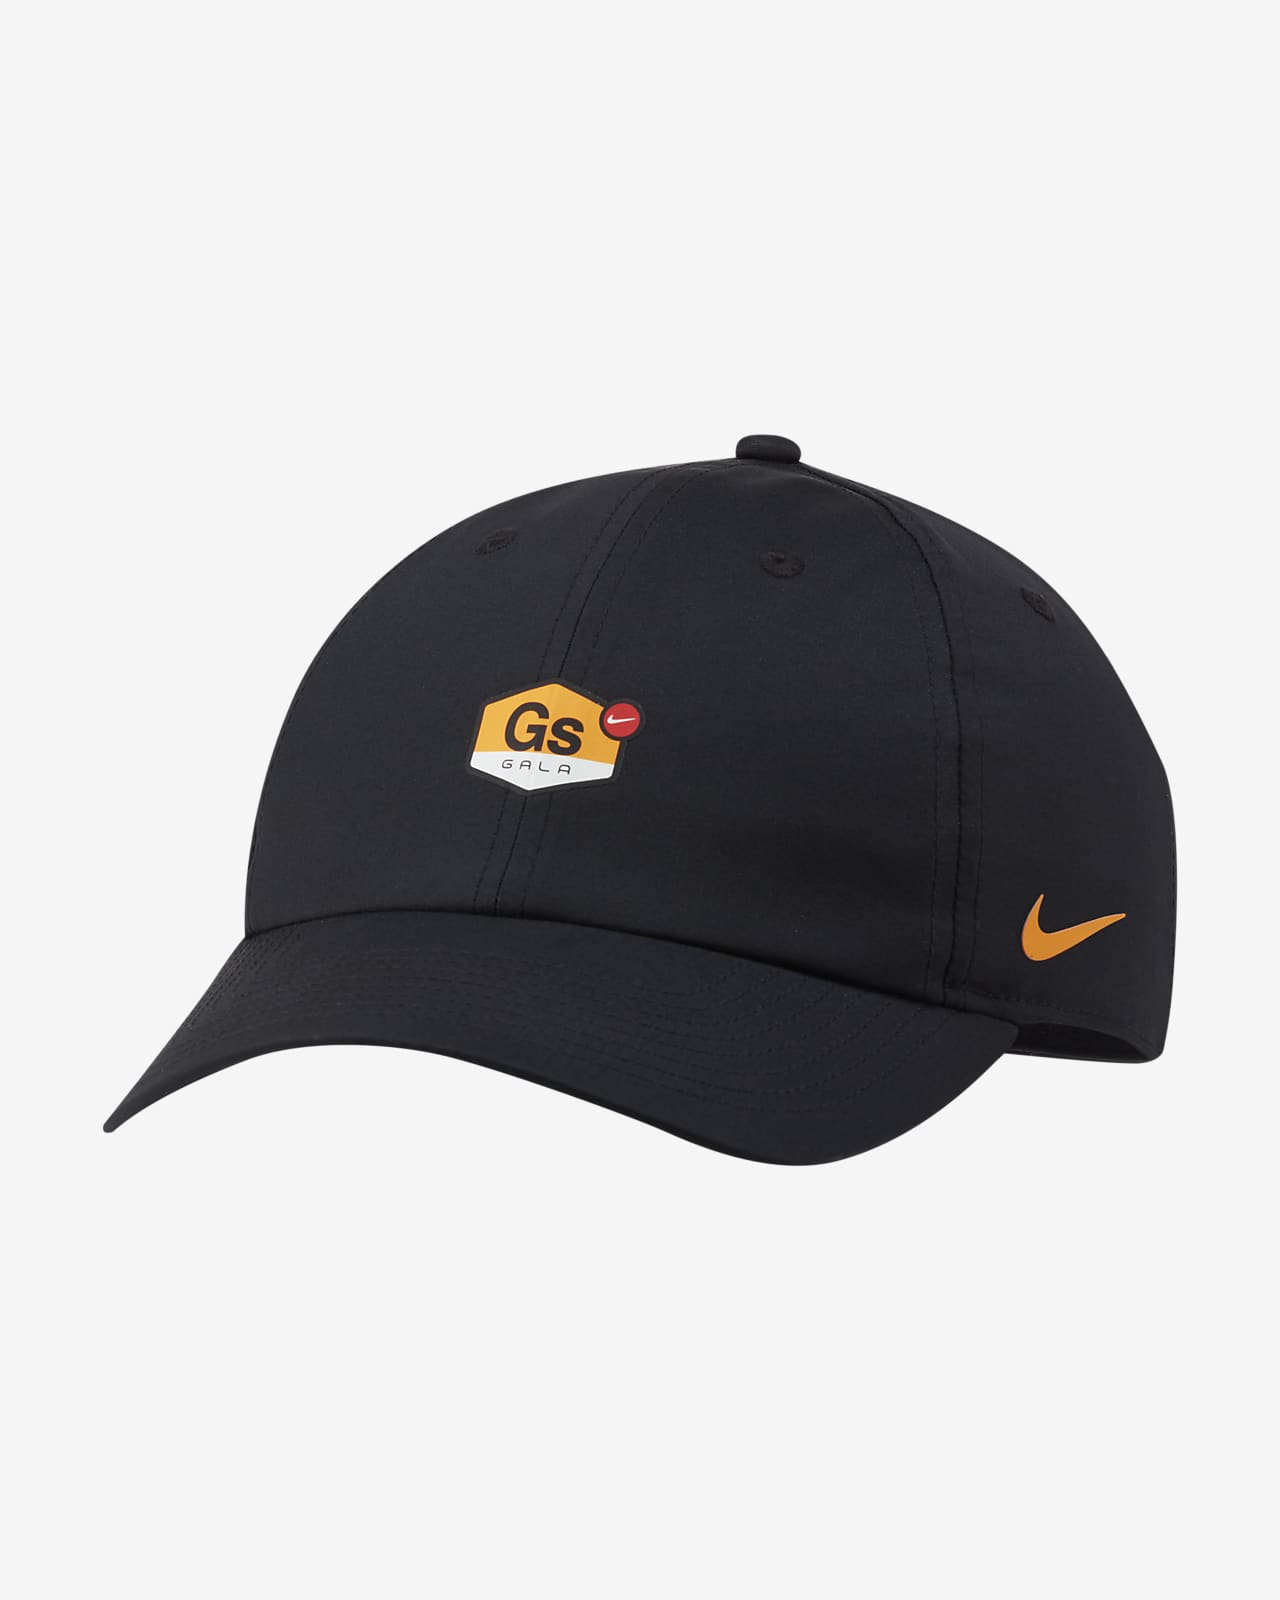 Nike Dri-FIT Galatasaray Heritage86 Adjustable Hat